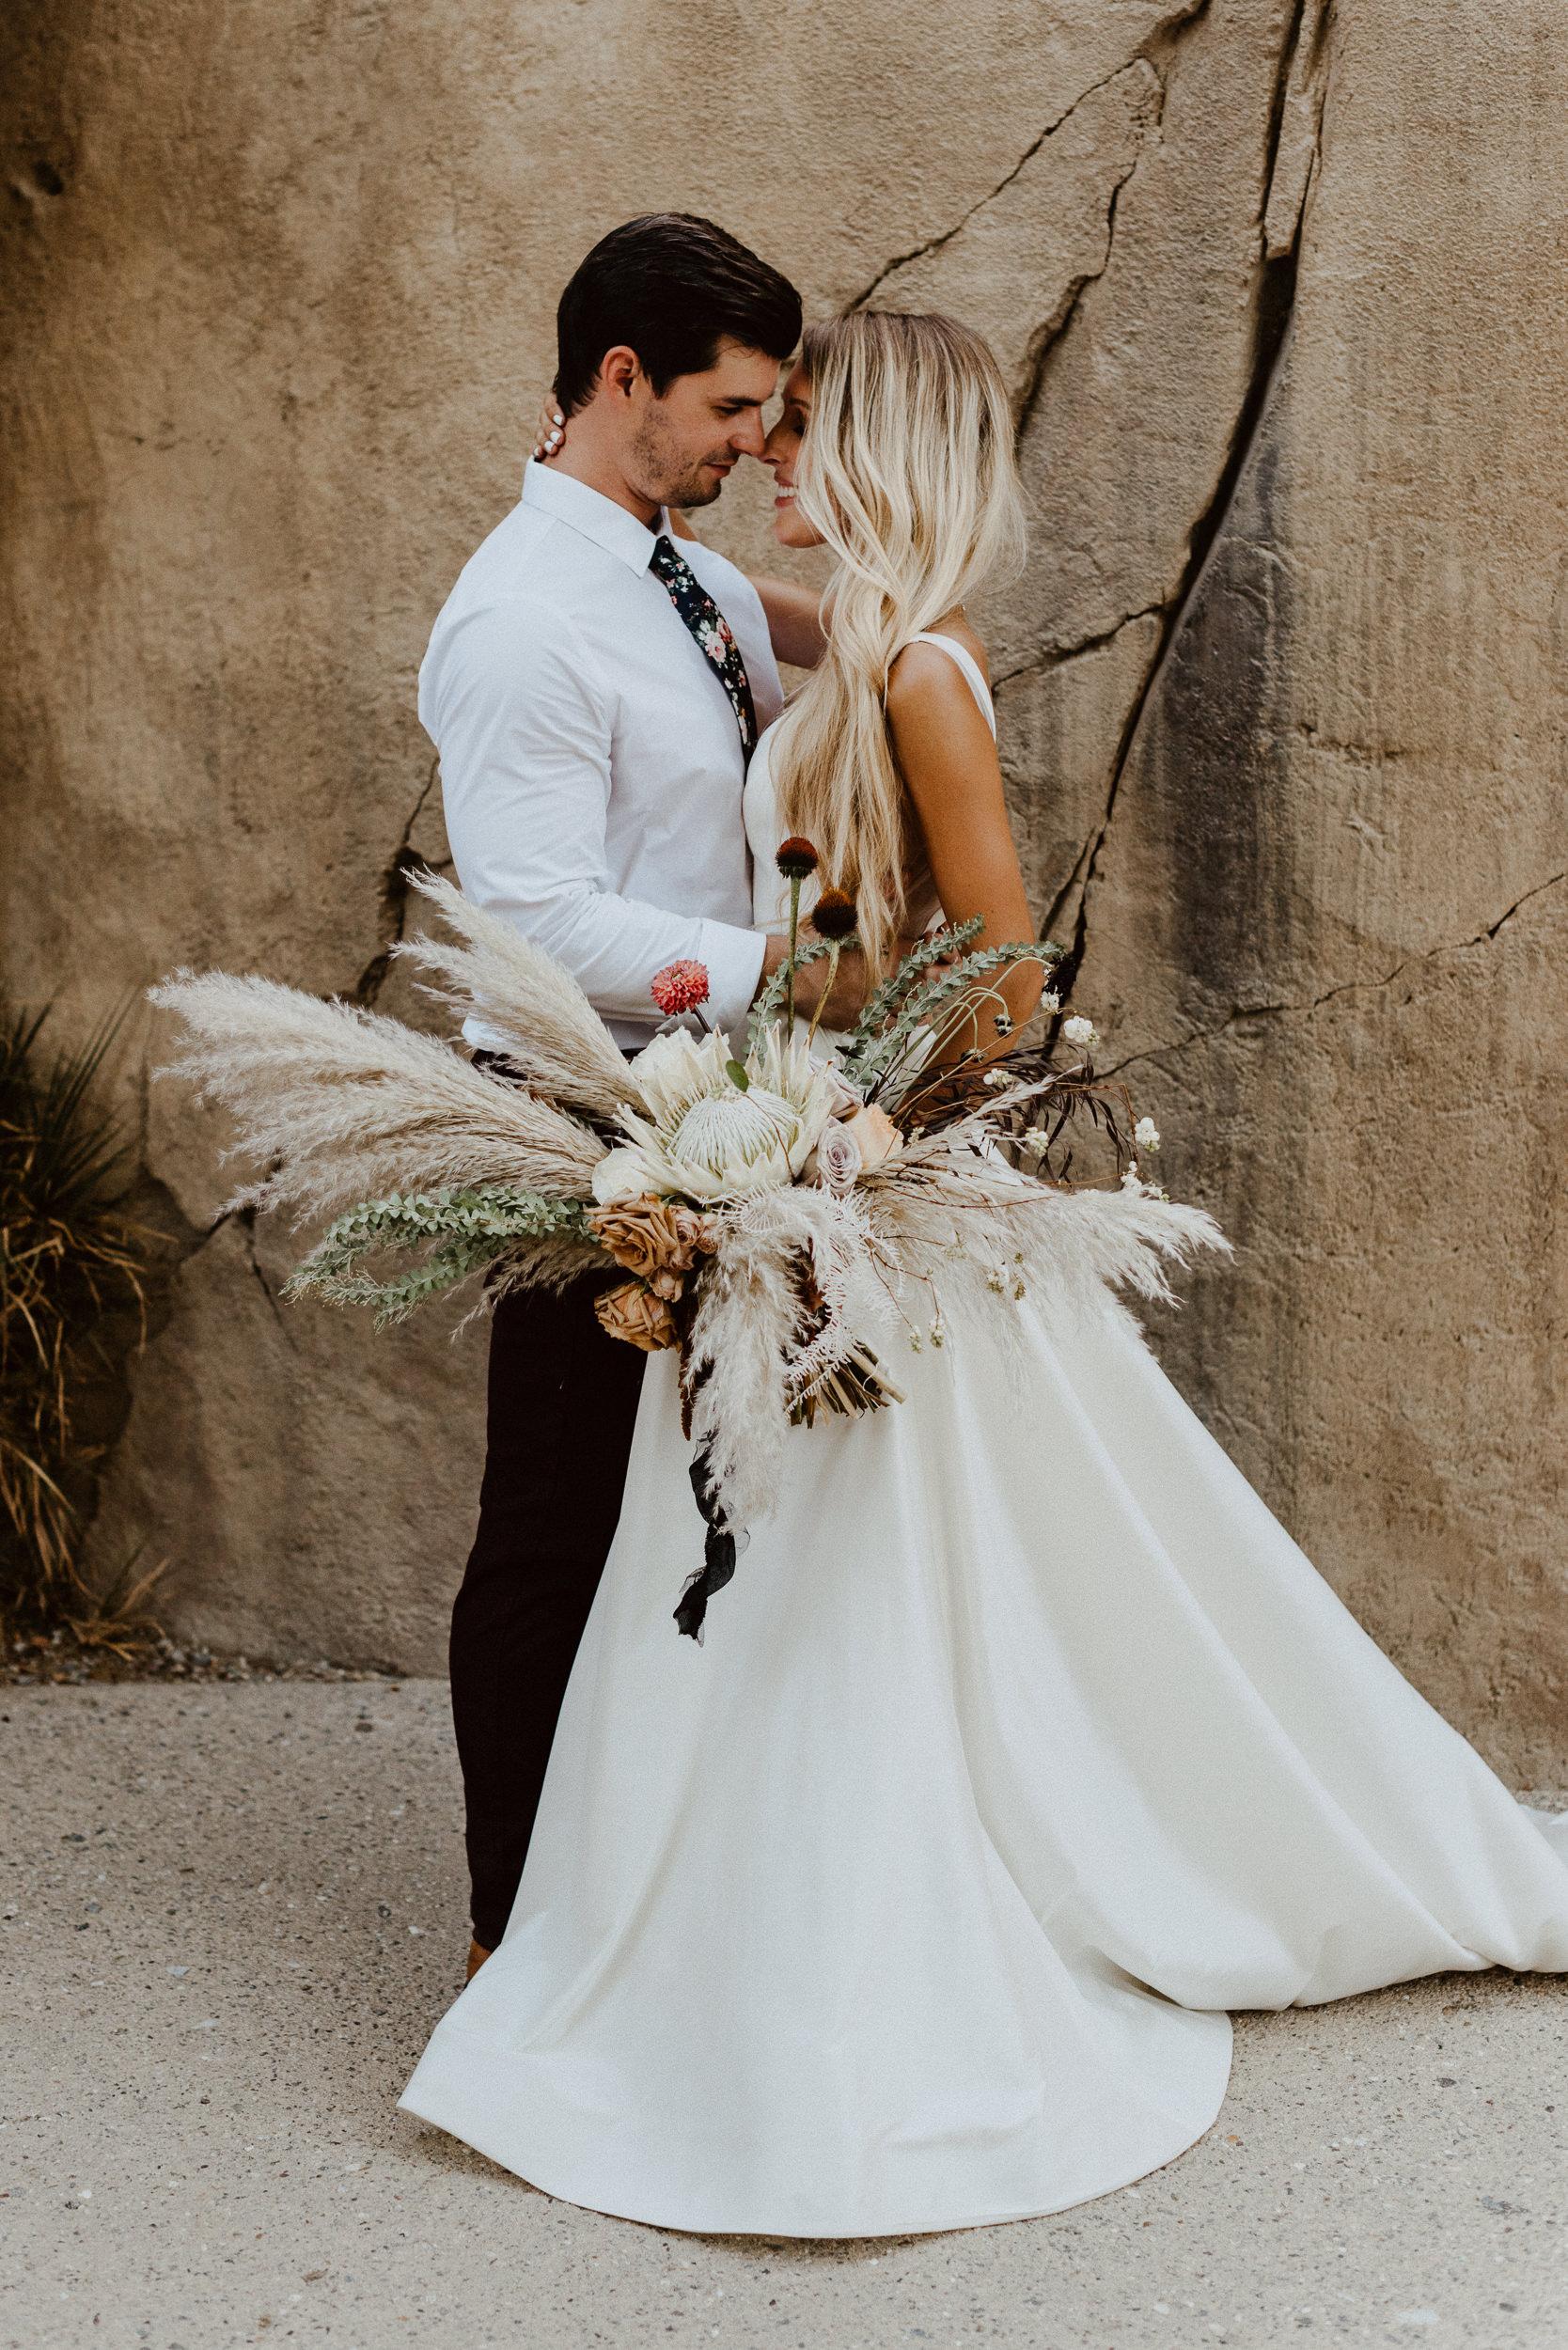 sChelsie + Chris - The Desert Shootout Wedding Romantics at The Living Desert-118.jpg